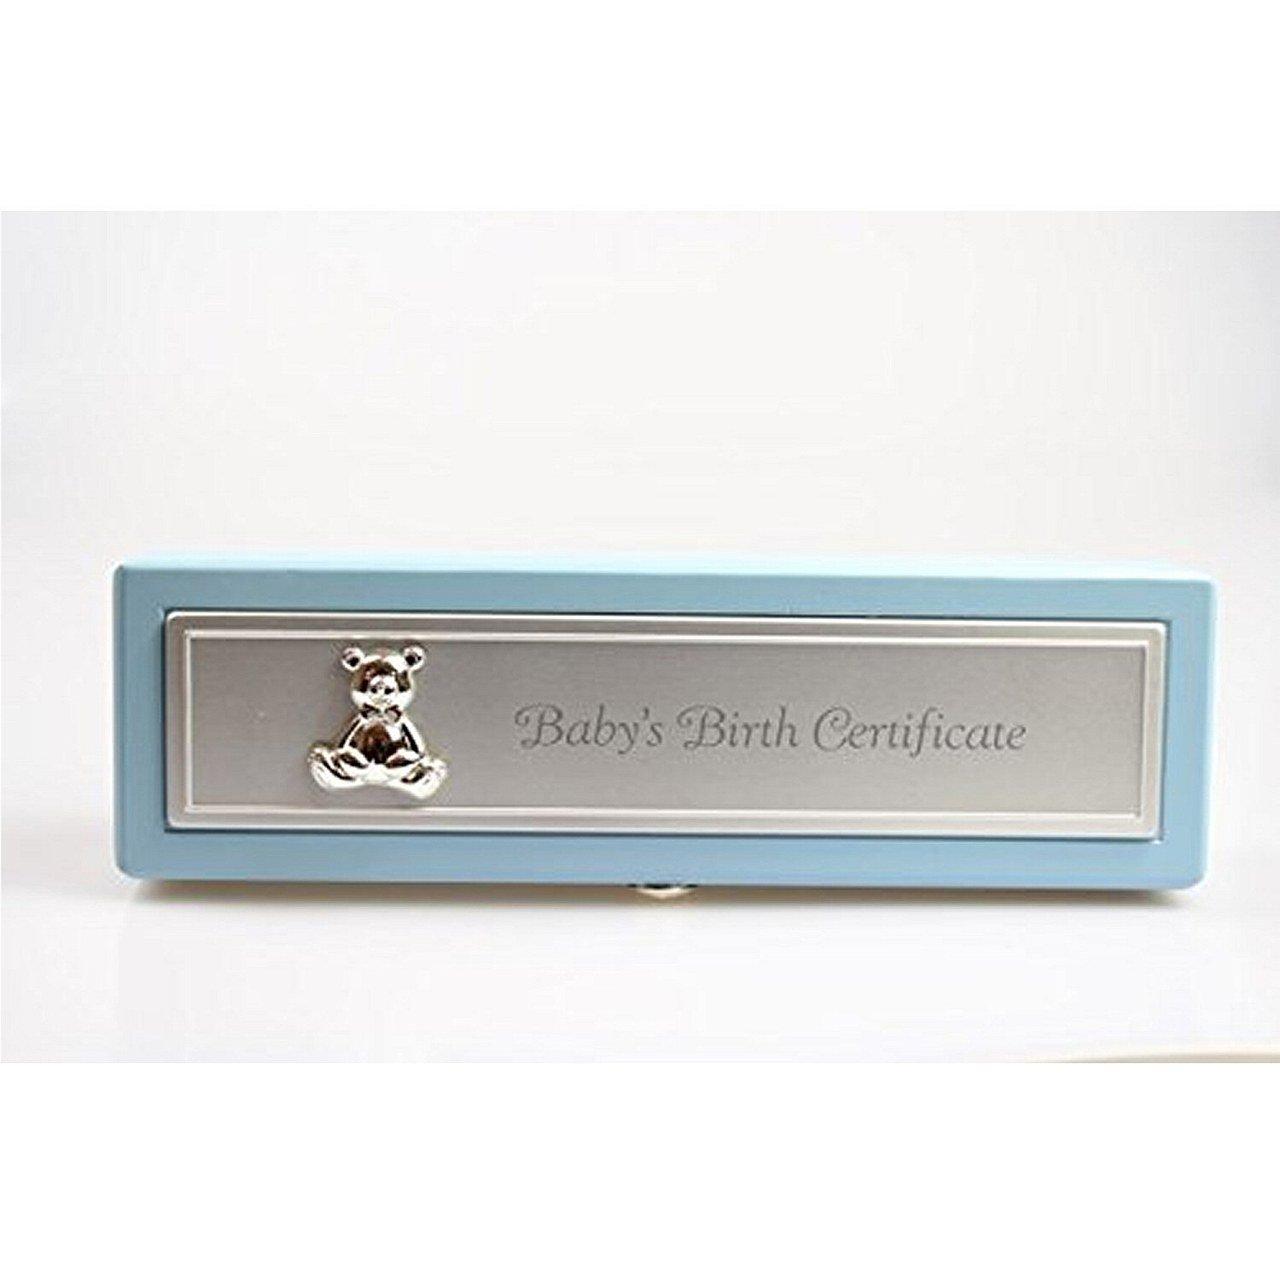 Birth Certificate Holder - Blue (Blue) Shudehill Giftware 52231